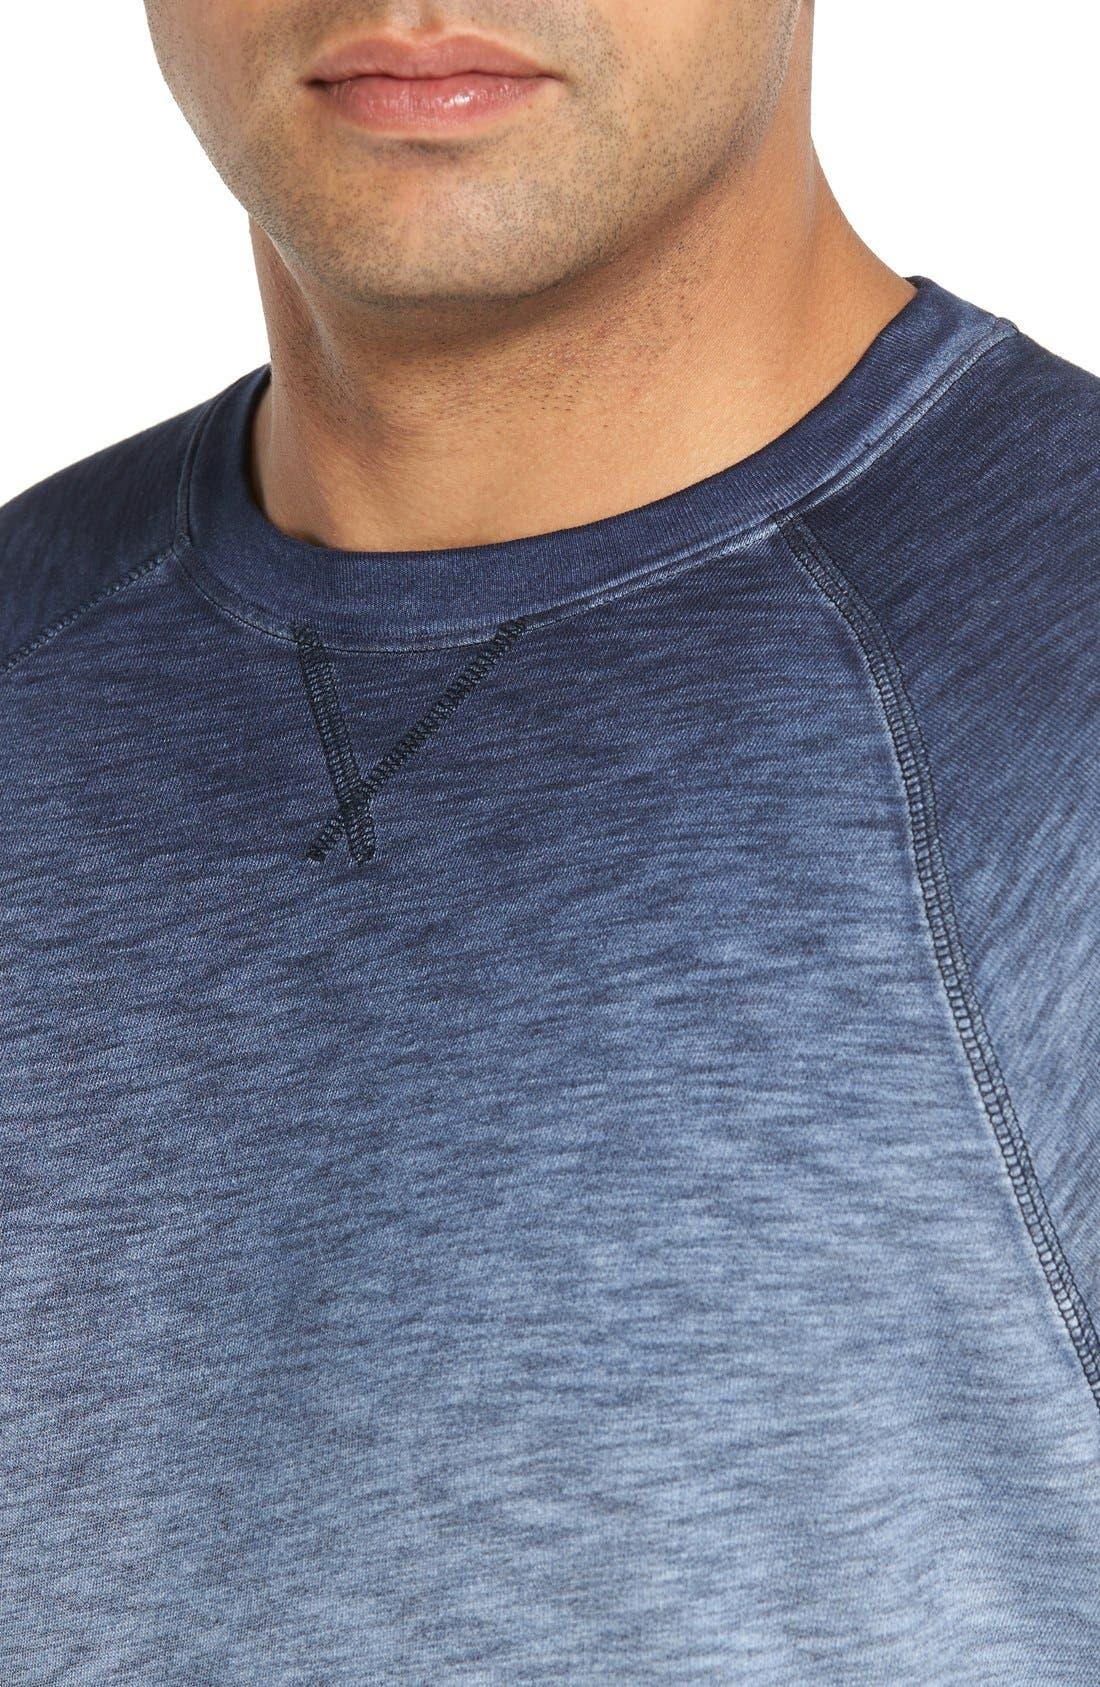 'Santiago' Ombré Crewneck Sweatshirt,                             Alternate thumbnail 4, color,                             Navy